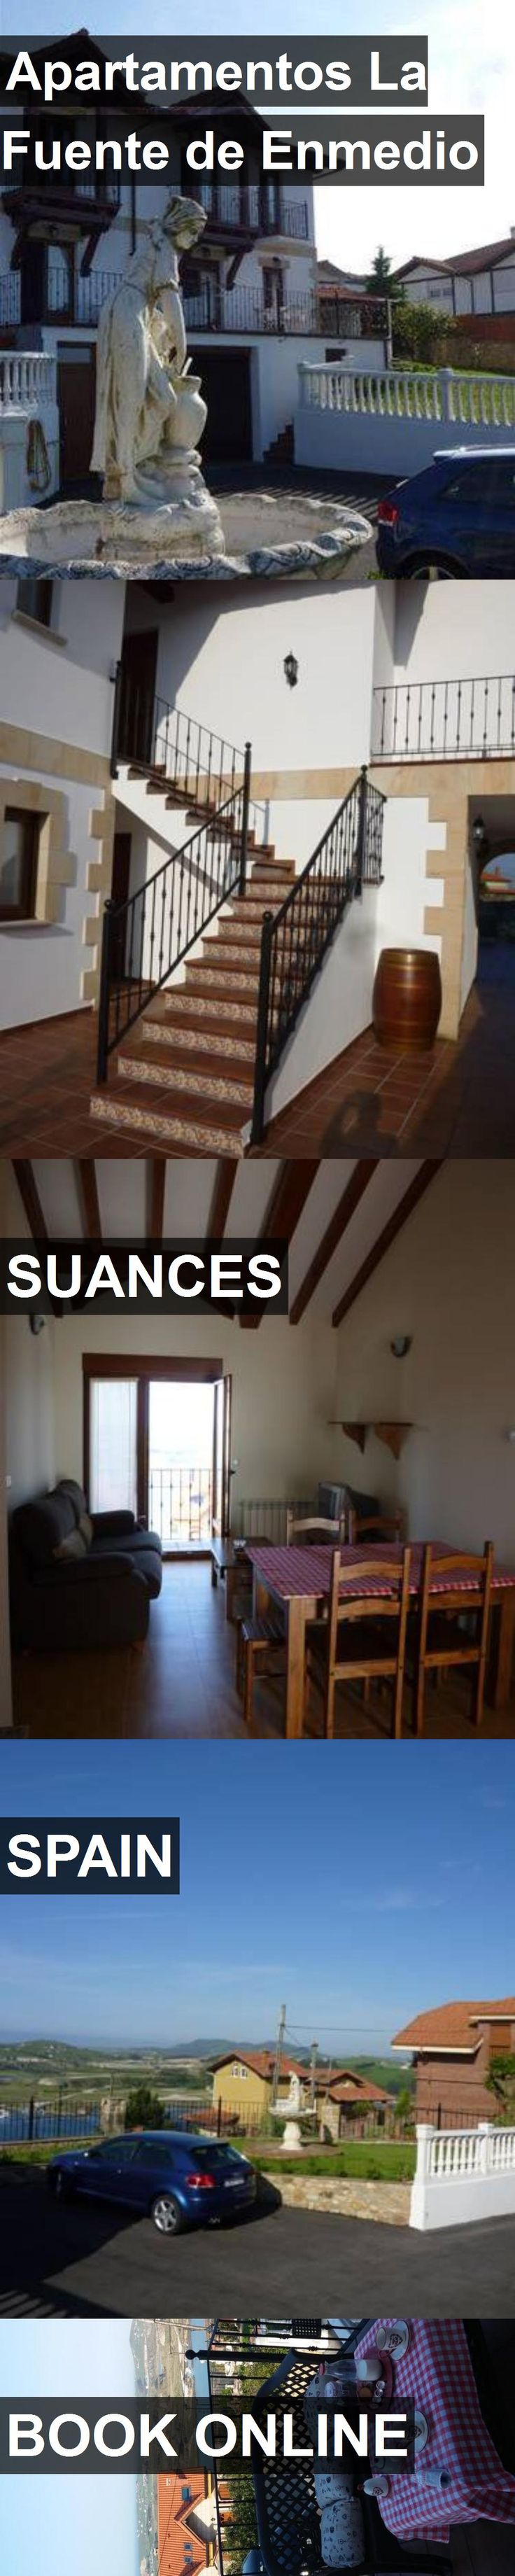 Hotel Apartamentos La Fuente de Enmedio in Suances, Spain. For more information, photos, reviews and best prices please follow the link. #Spain #Suances #travel #vacation #hotel